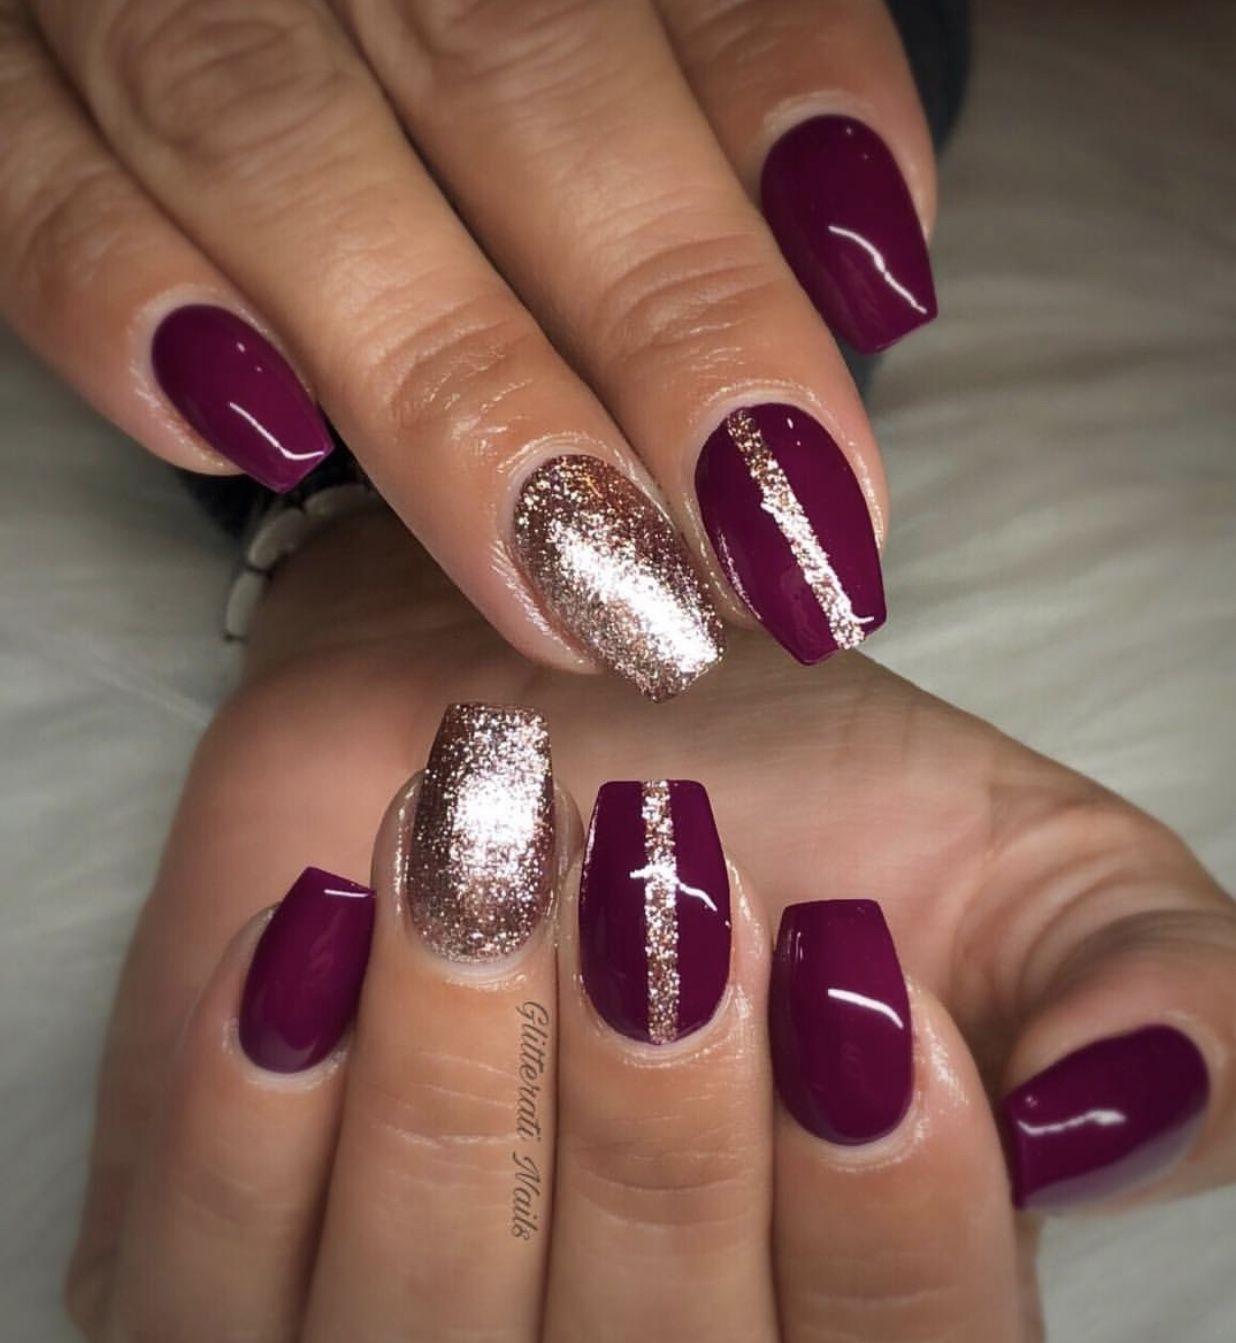 pretty fall winter nails. burgundy